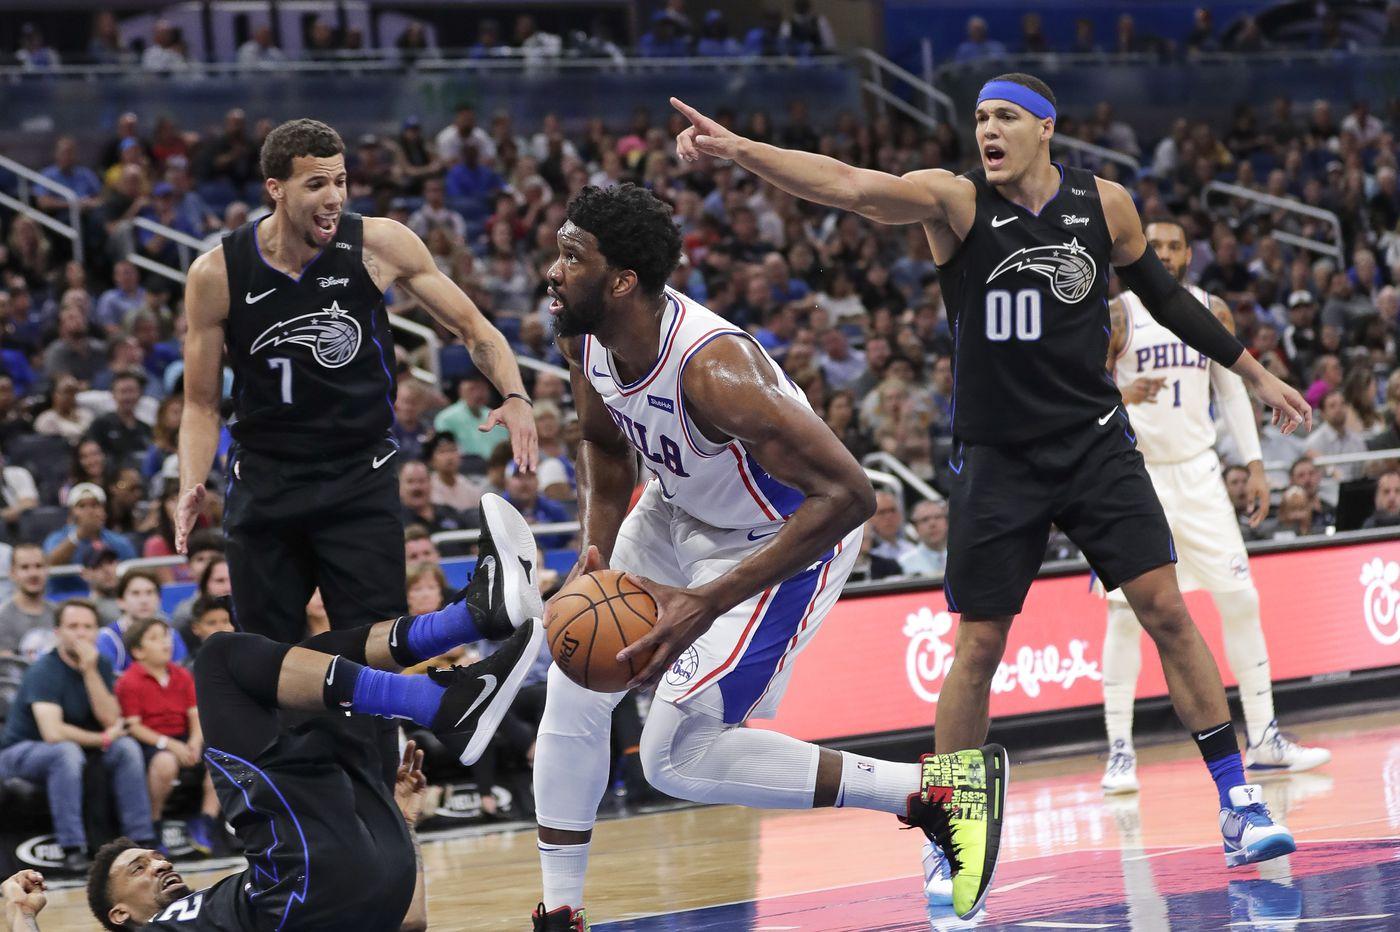 Sixers fall flat in Orlando, lose 119-98